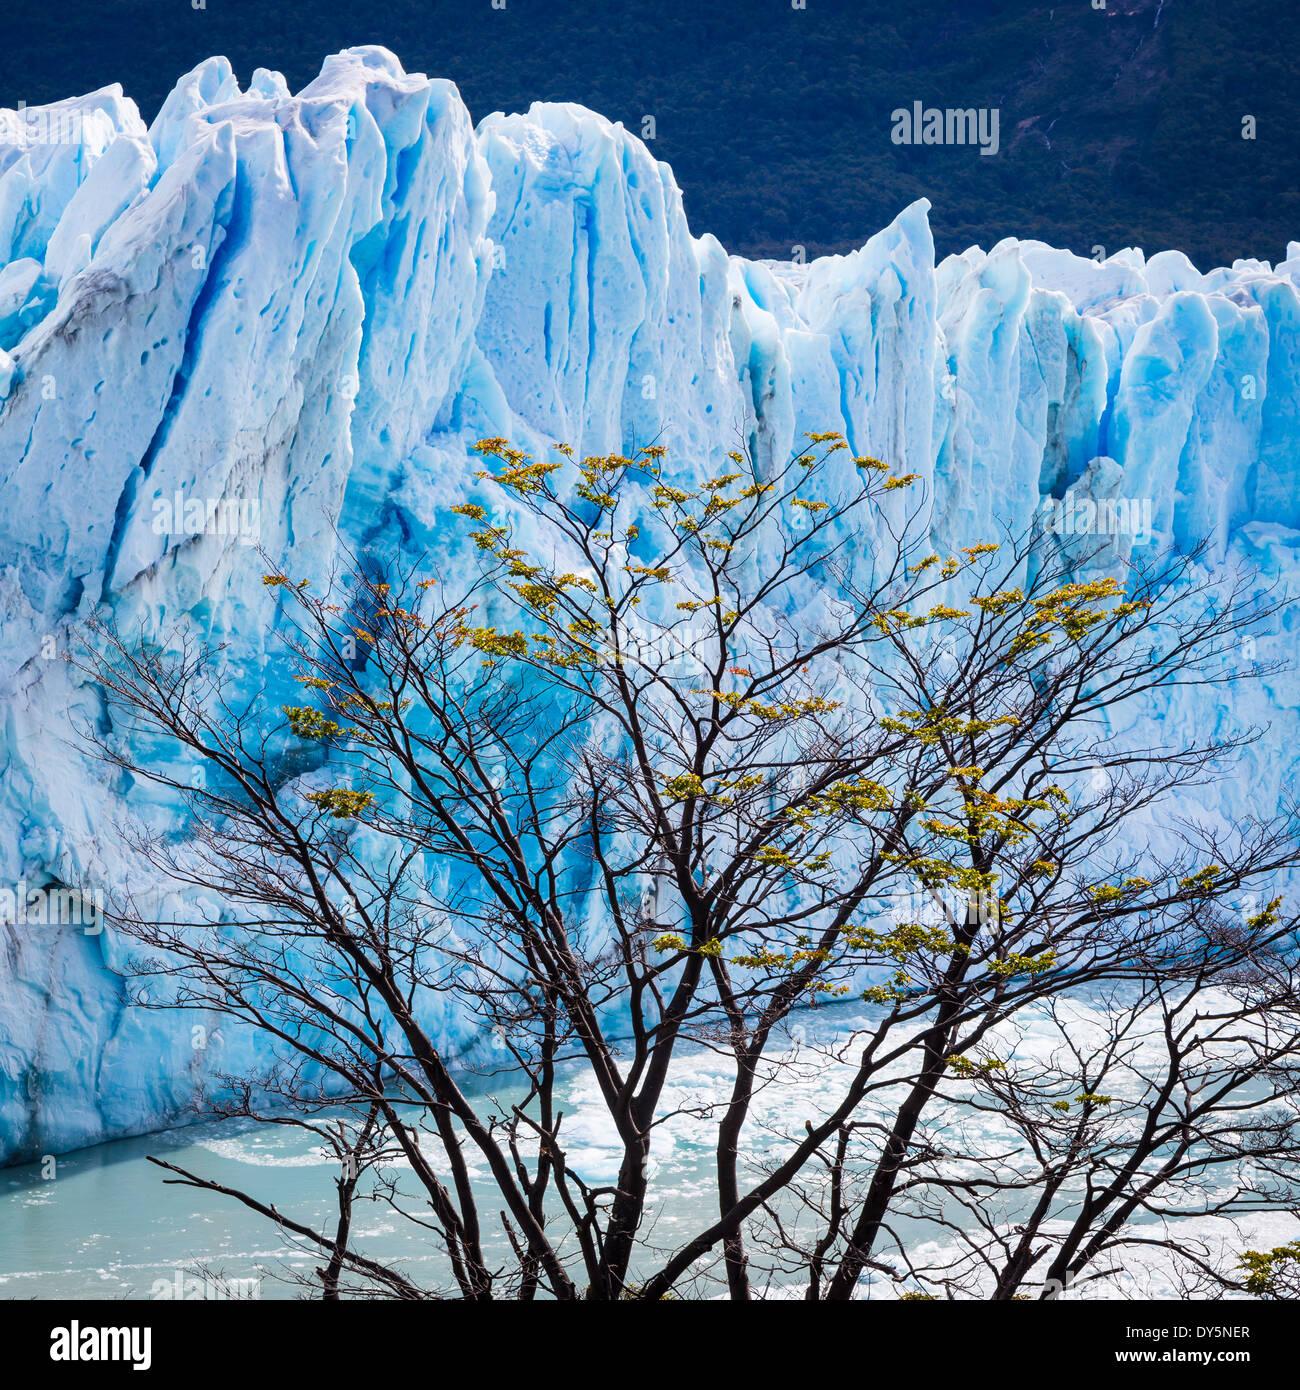 Le Glacier Perito Moreno est un glacier situé dans le Parc National Los Glaciares, dans le sud-ouest de la province de Santa Cruz, en Argentine. Photo Stock